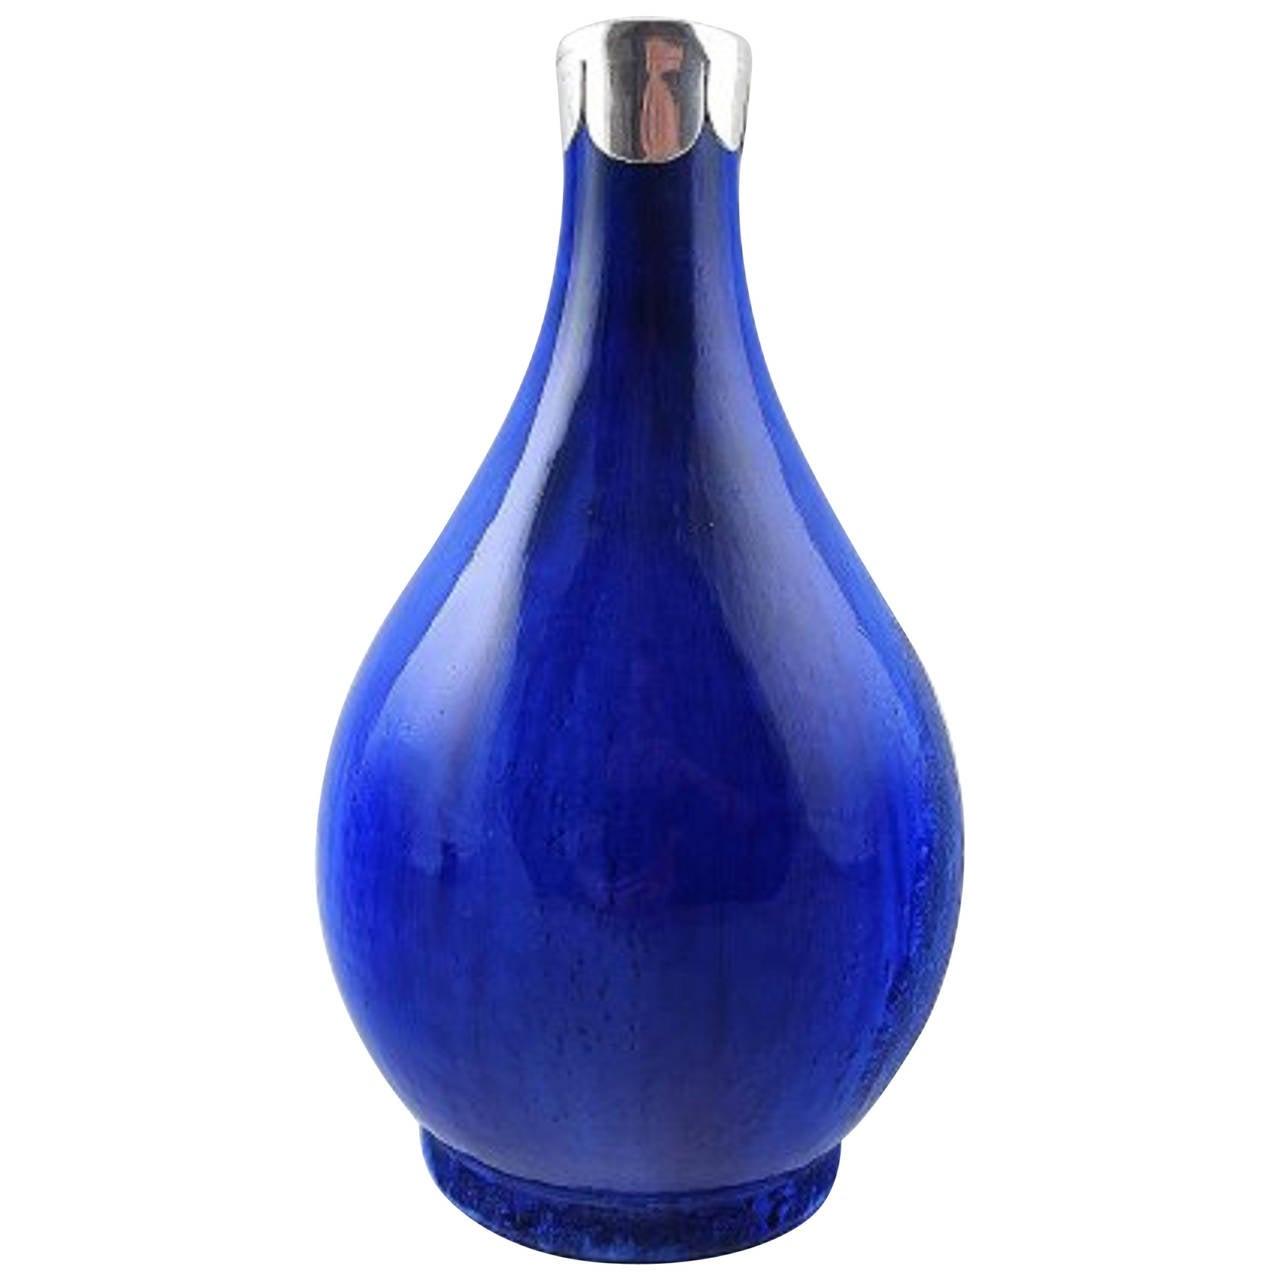 Unique soren berg for royal copenhagen crystal glaze vase with unique soren berg for royal copenhagen crystal glaze vase with silver mounts for sale reviewsmspy